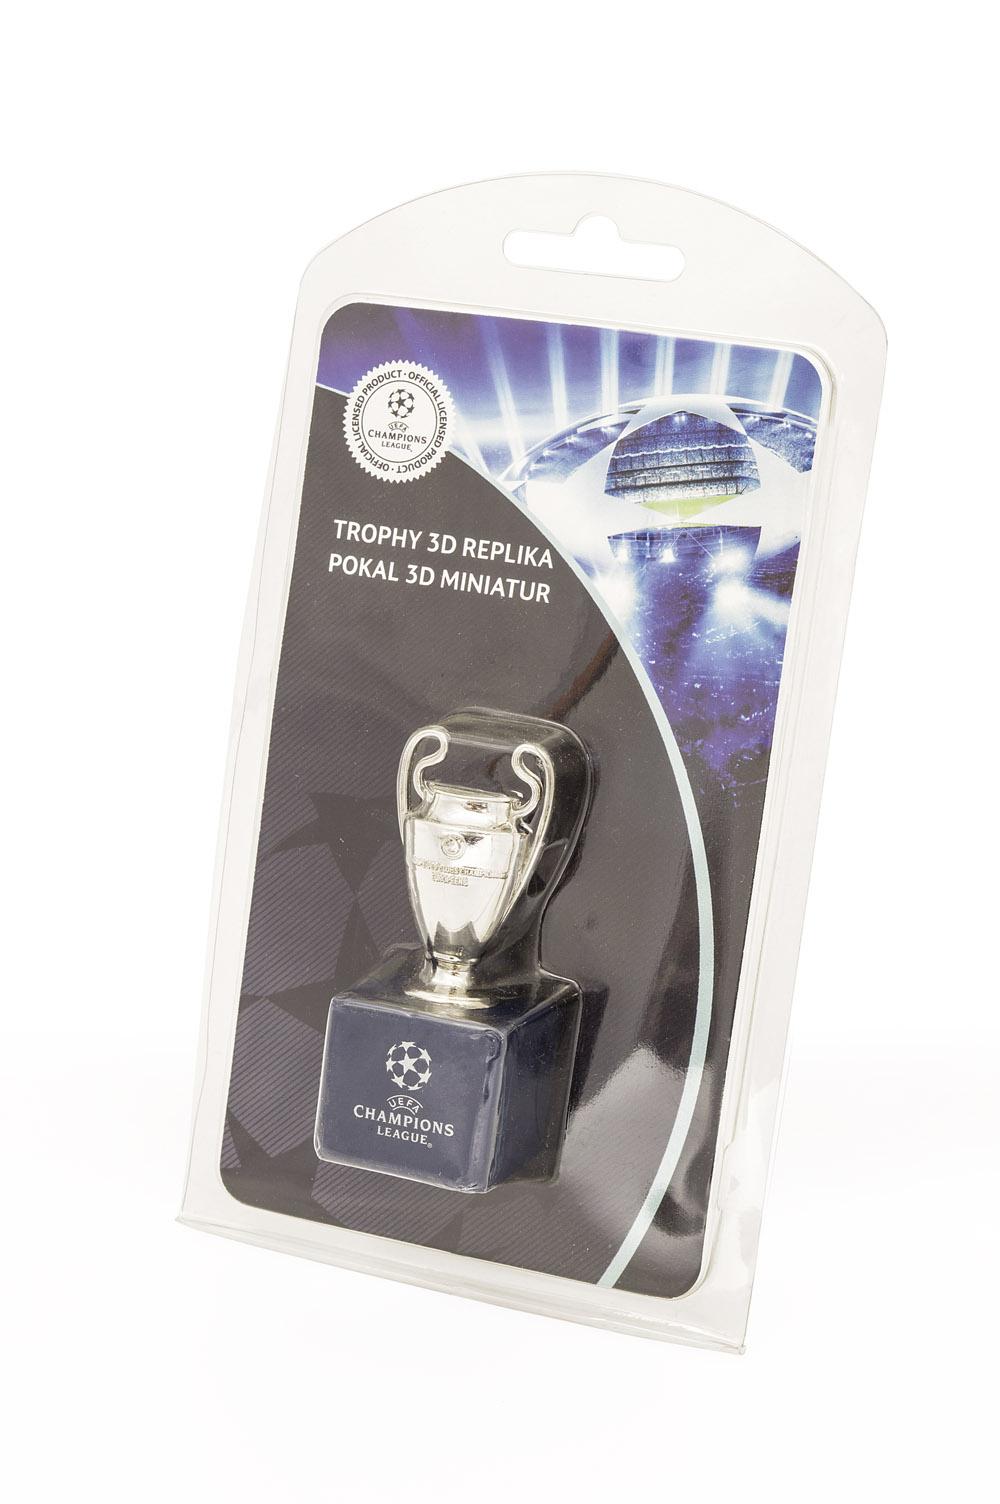 uefa champions league mini replica trophy national football museum uefa champions league mini replica trophy